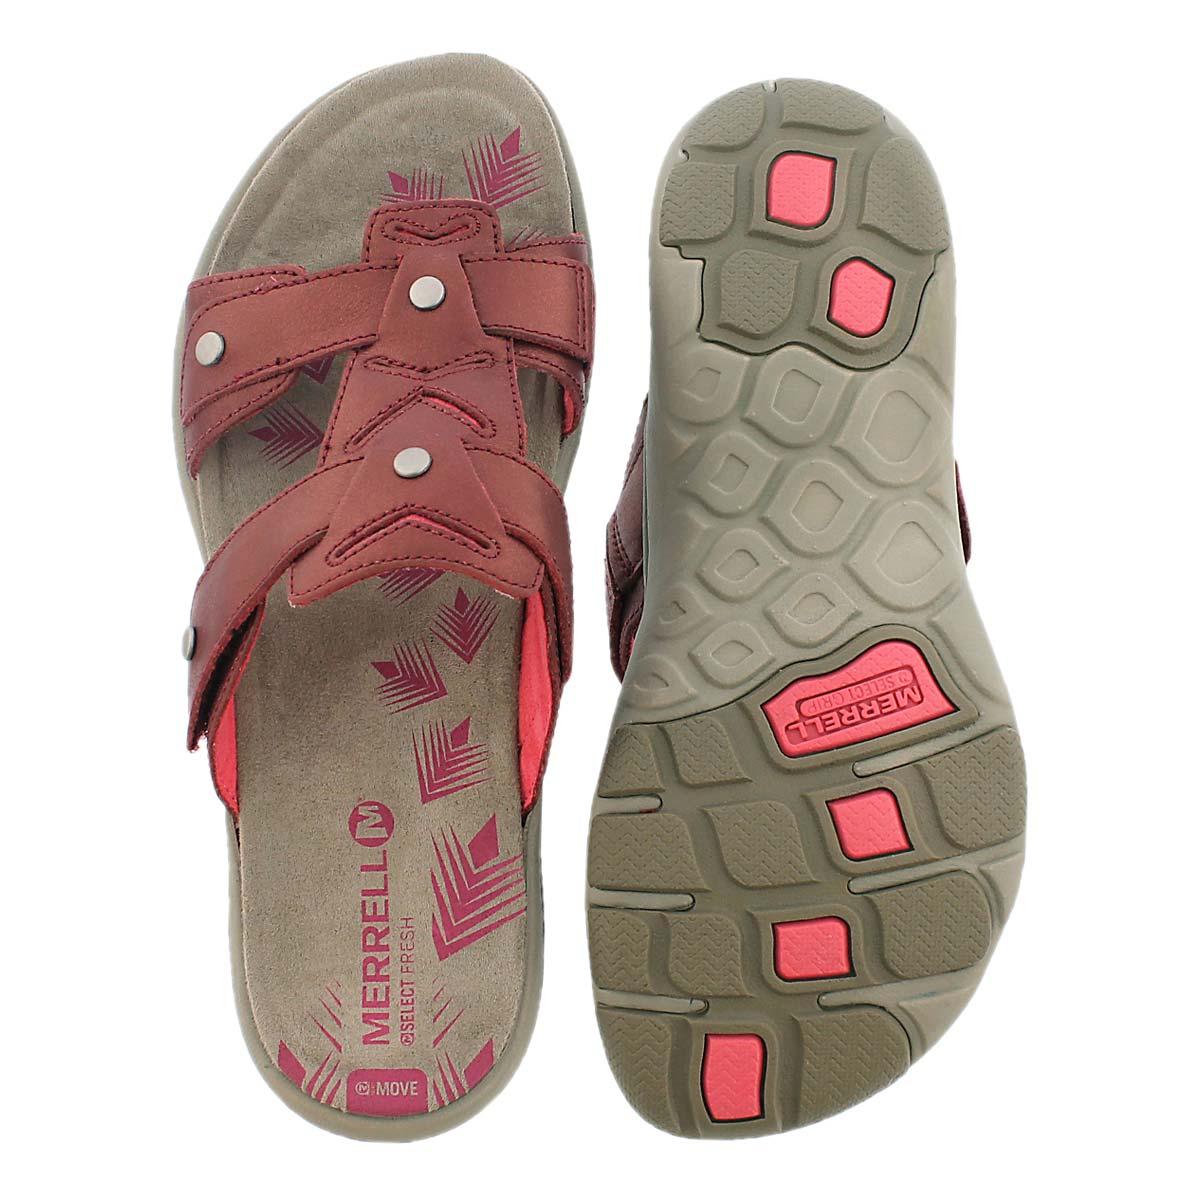 Lds Adhera Slide red casual slide sandal